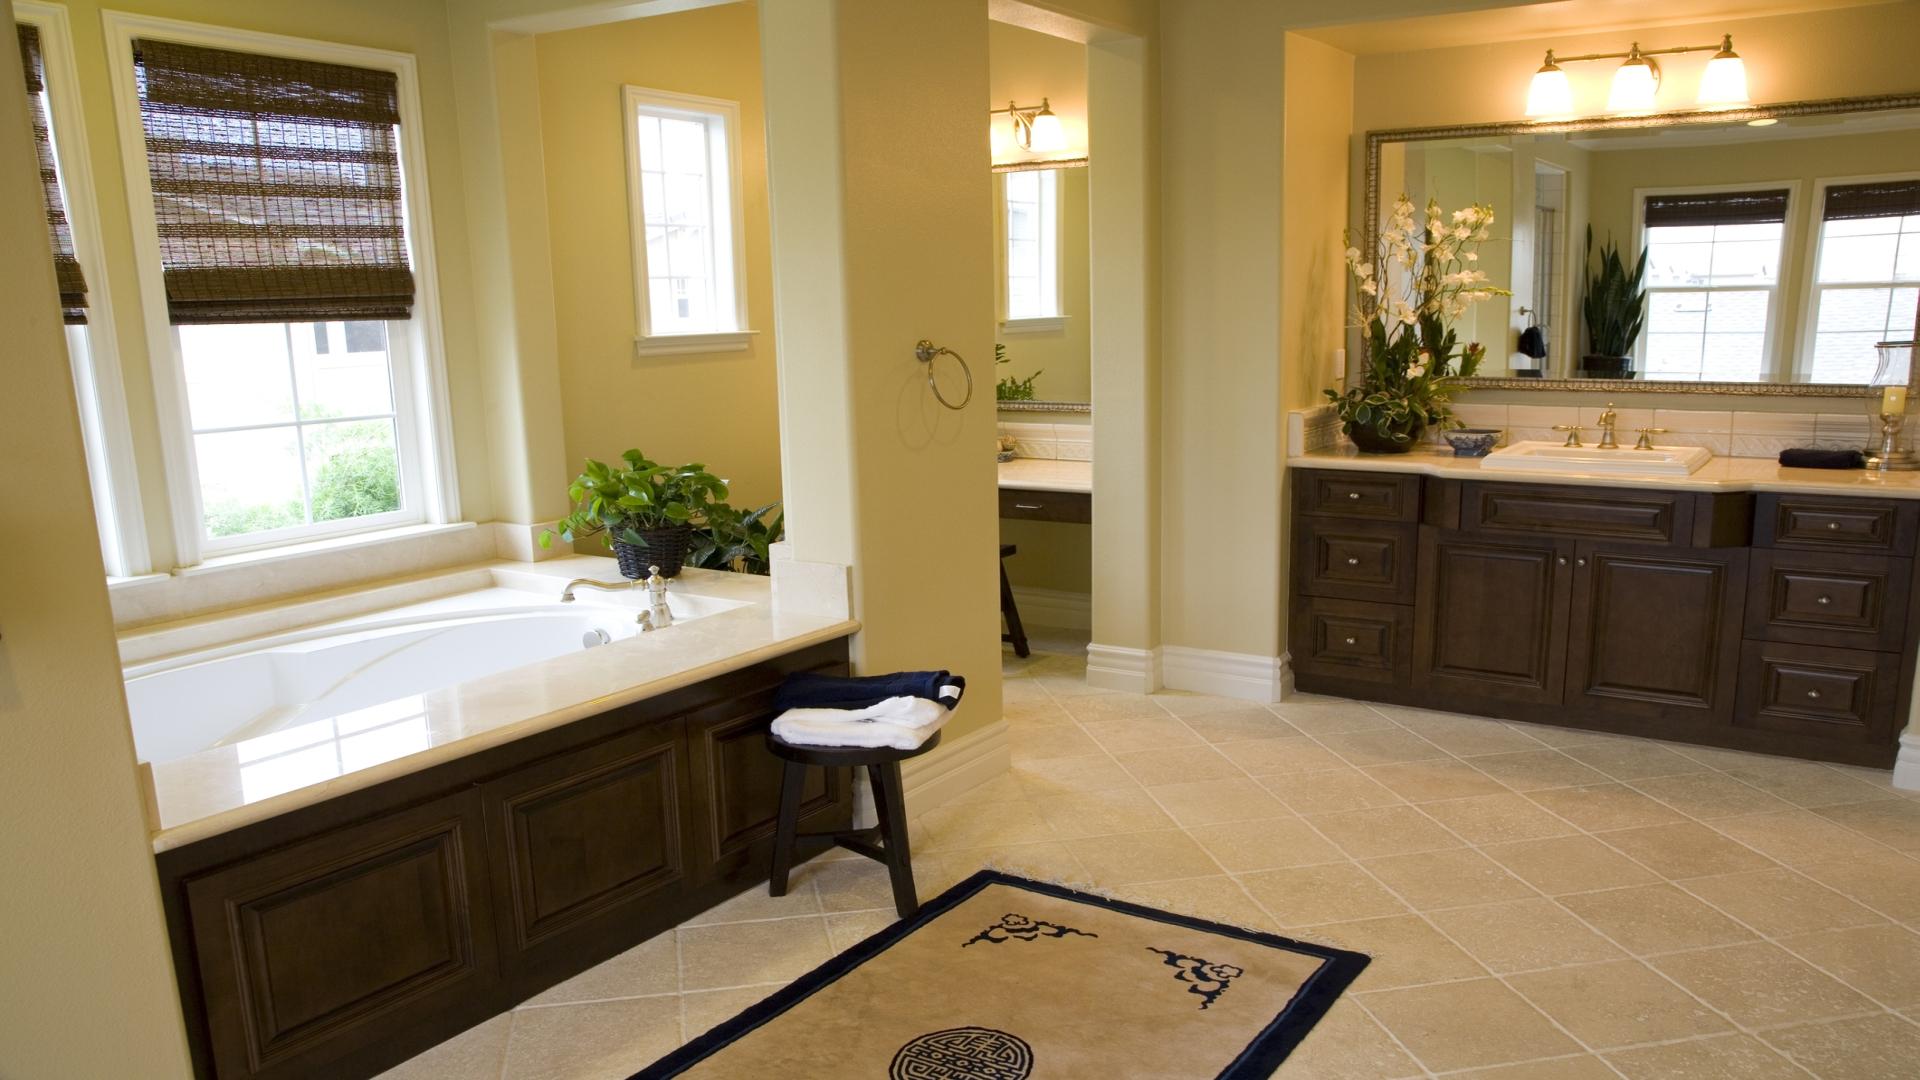 Bathroom Remodeling Bradenton kitchen remodeling bradenton | bathroom remodeling bradenton